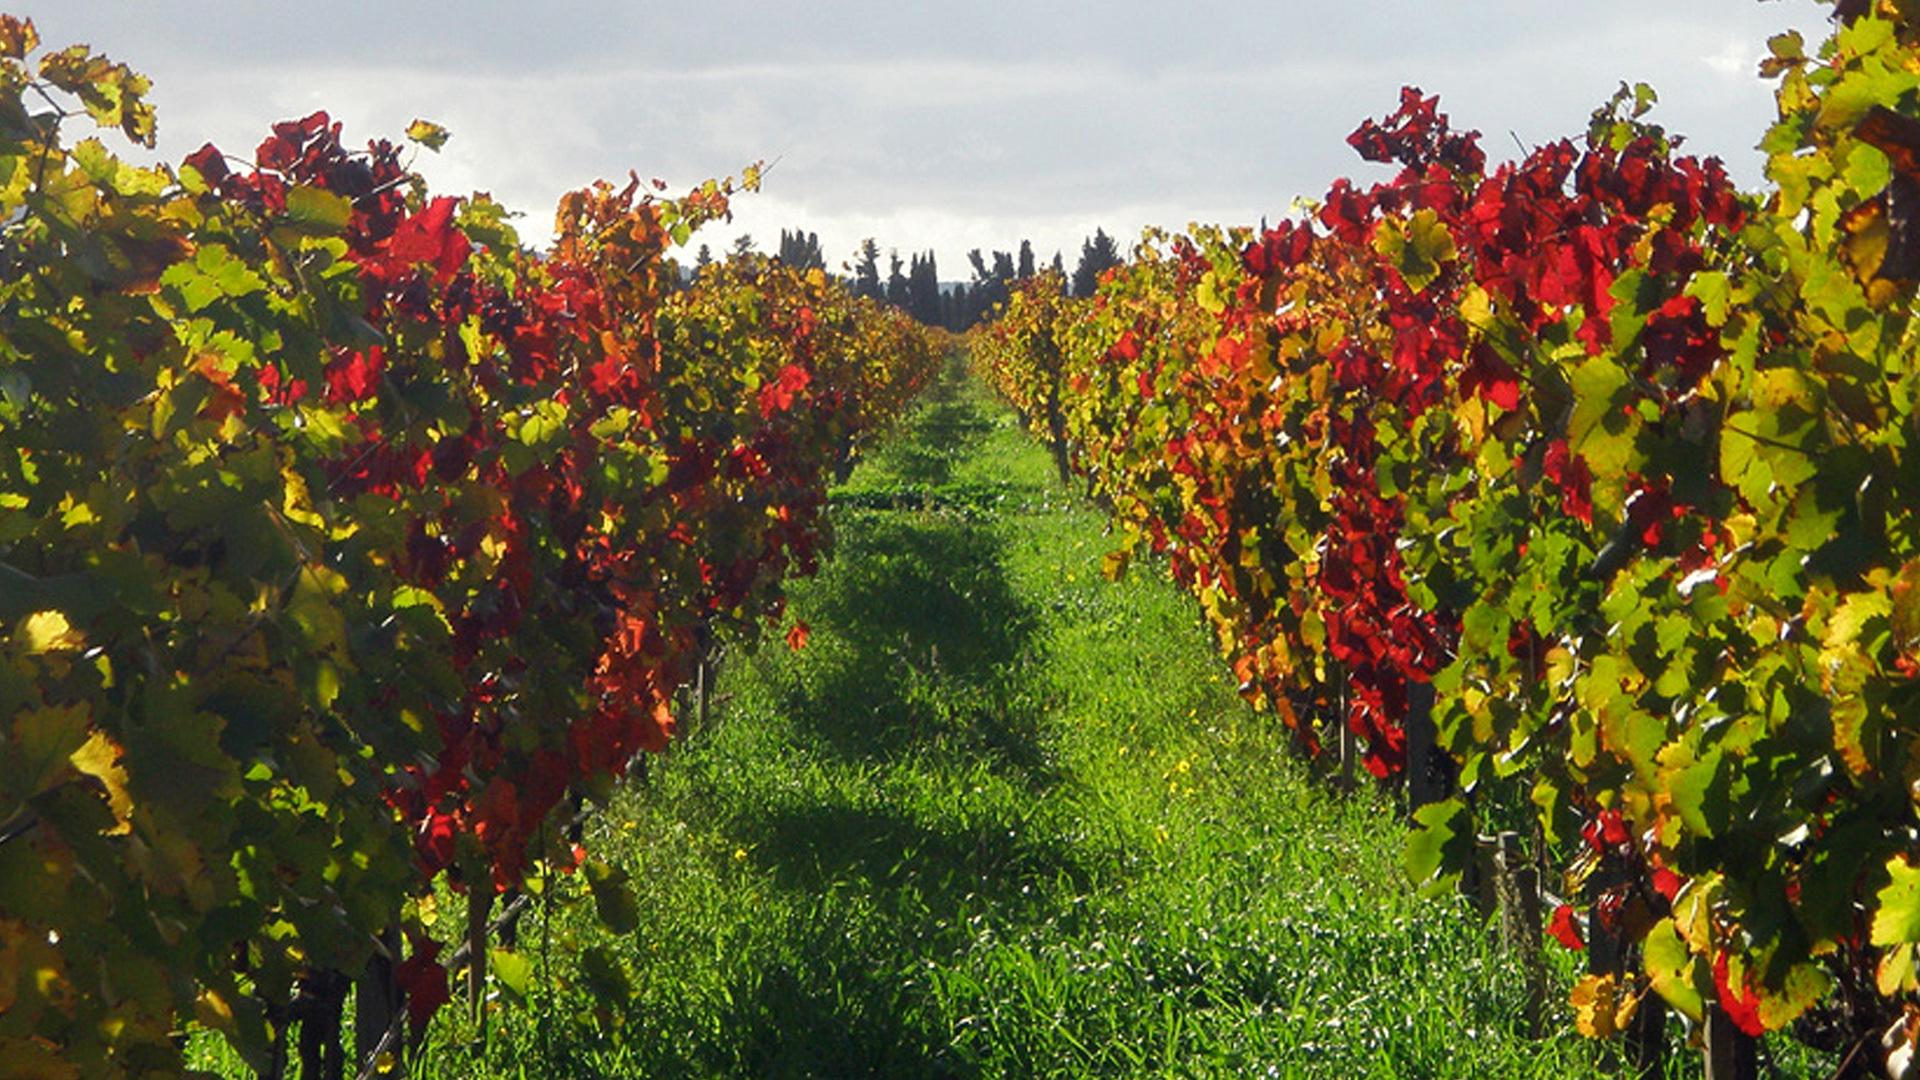 Vineyard Biniagual